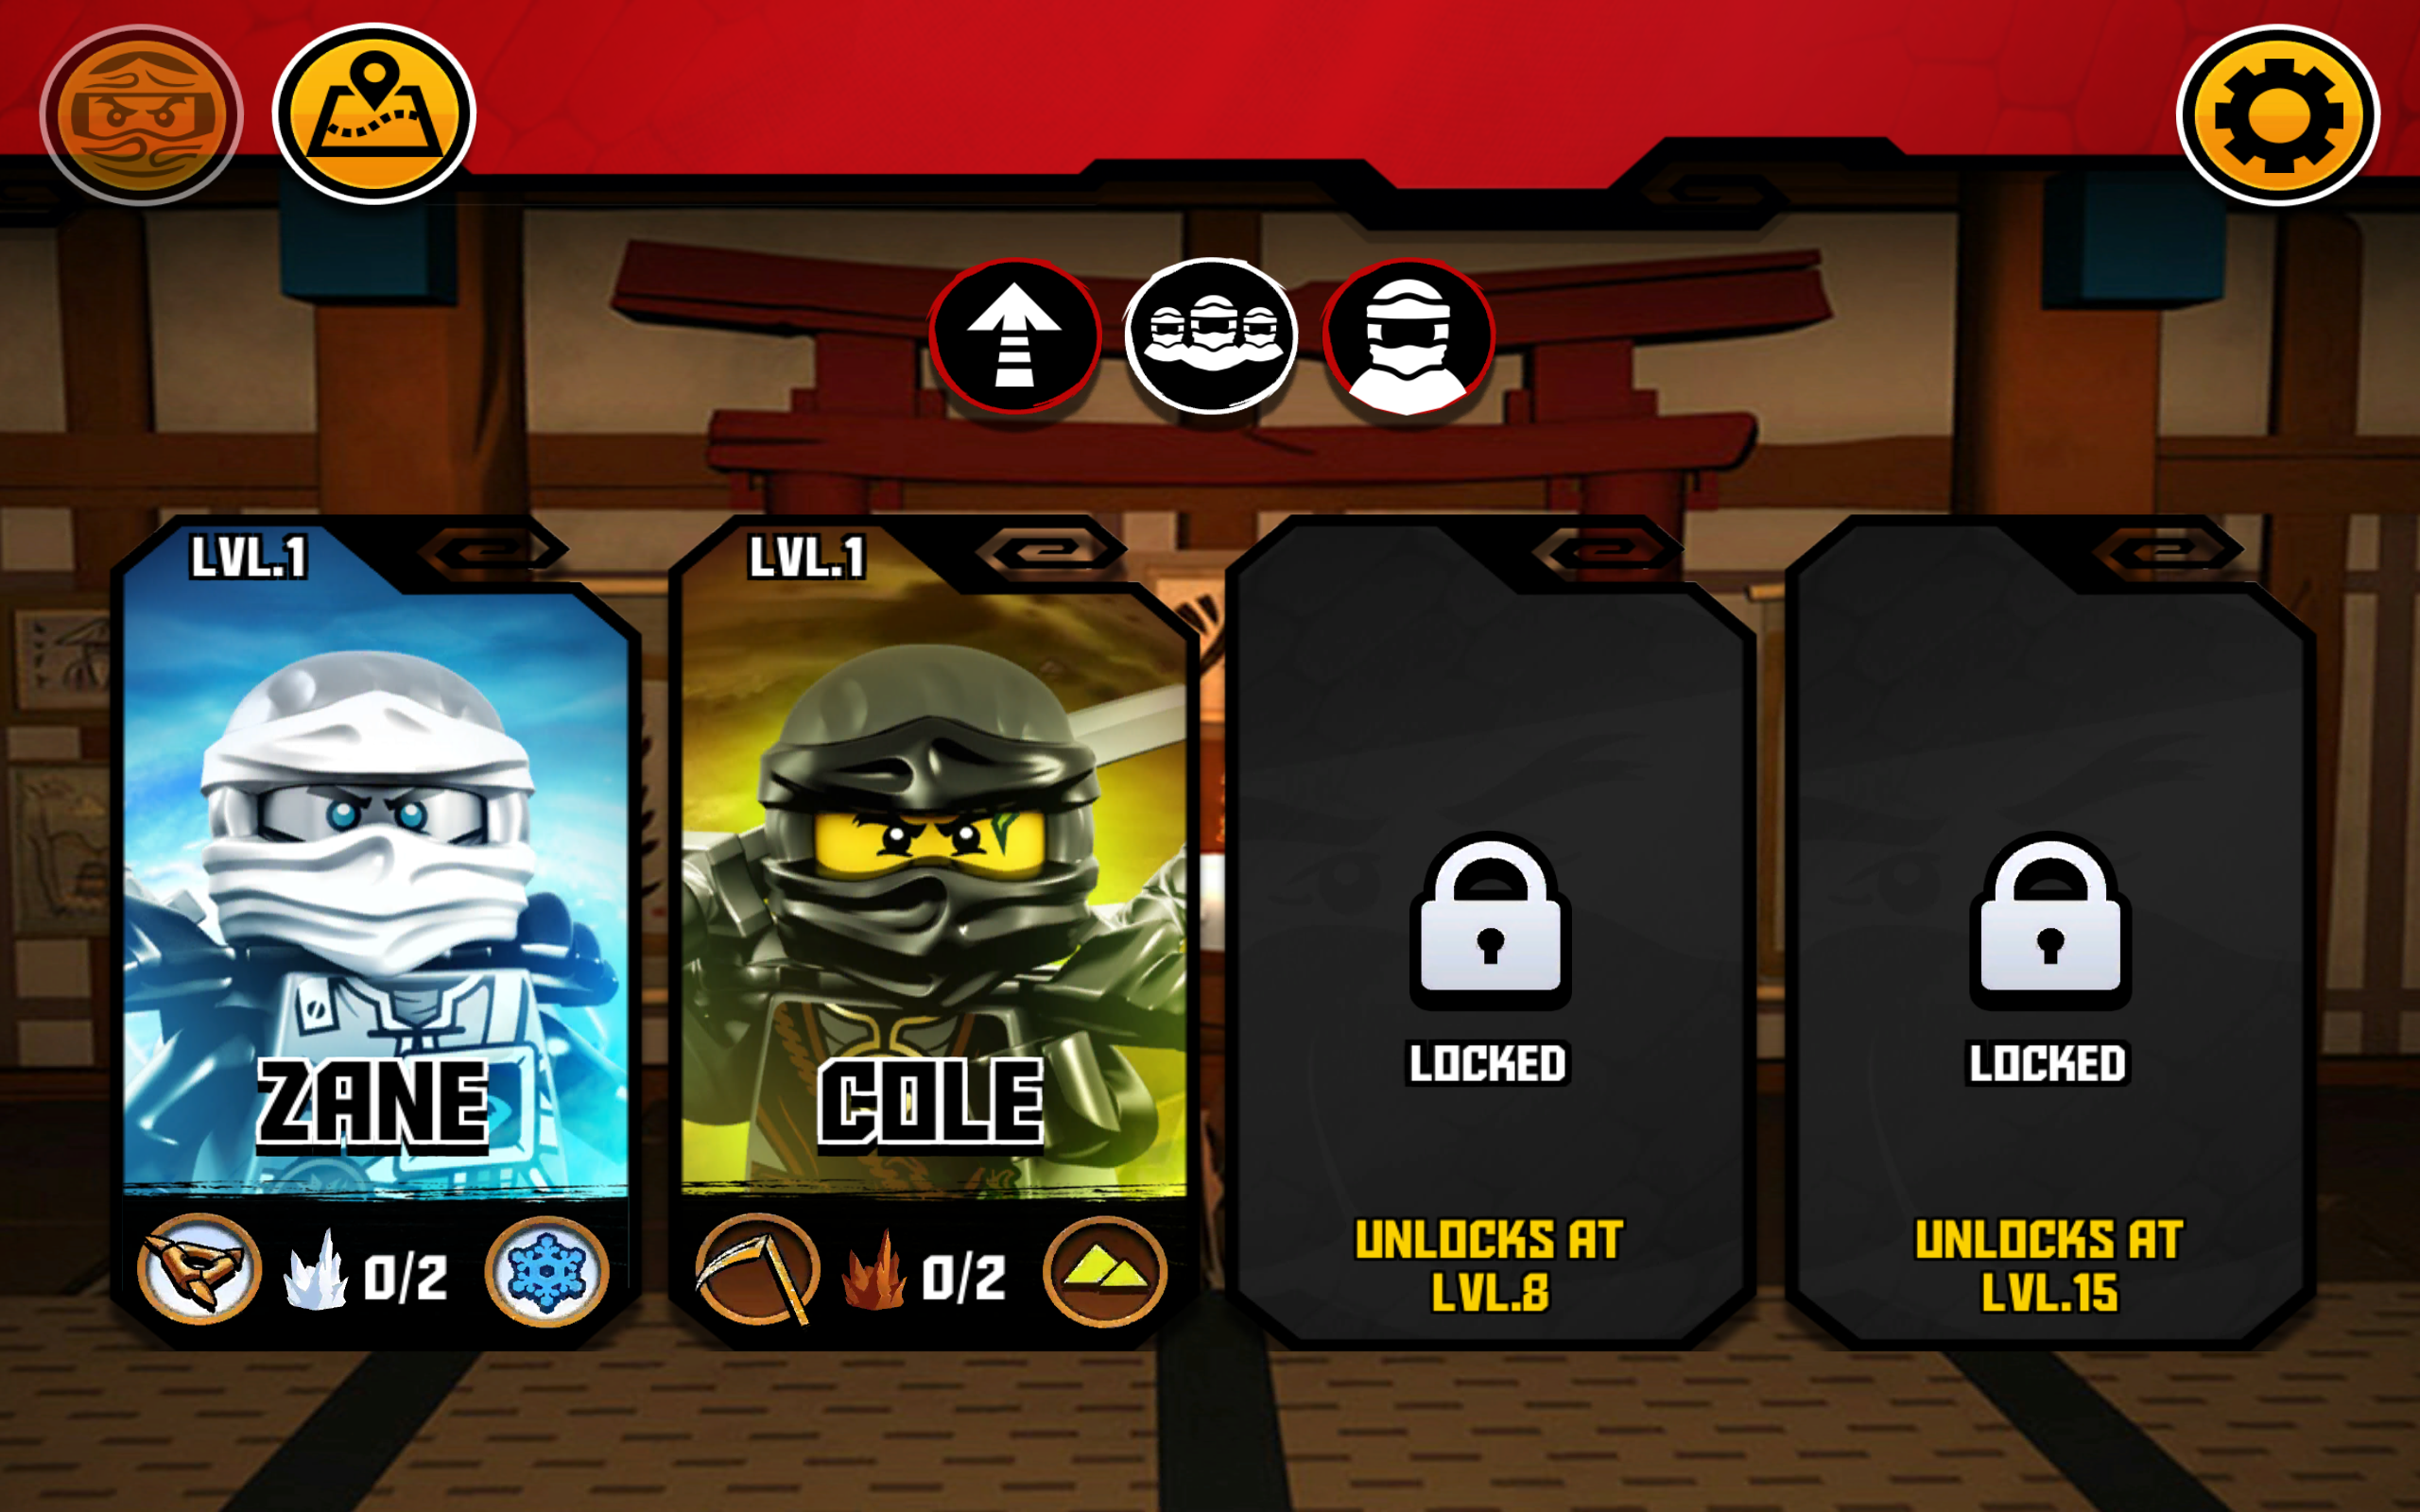 Amazoncom The Lego Ninjago Movie App Appstore For Android